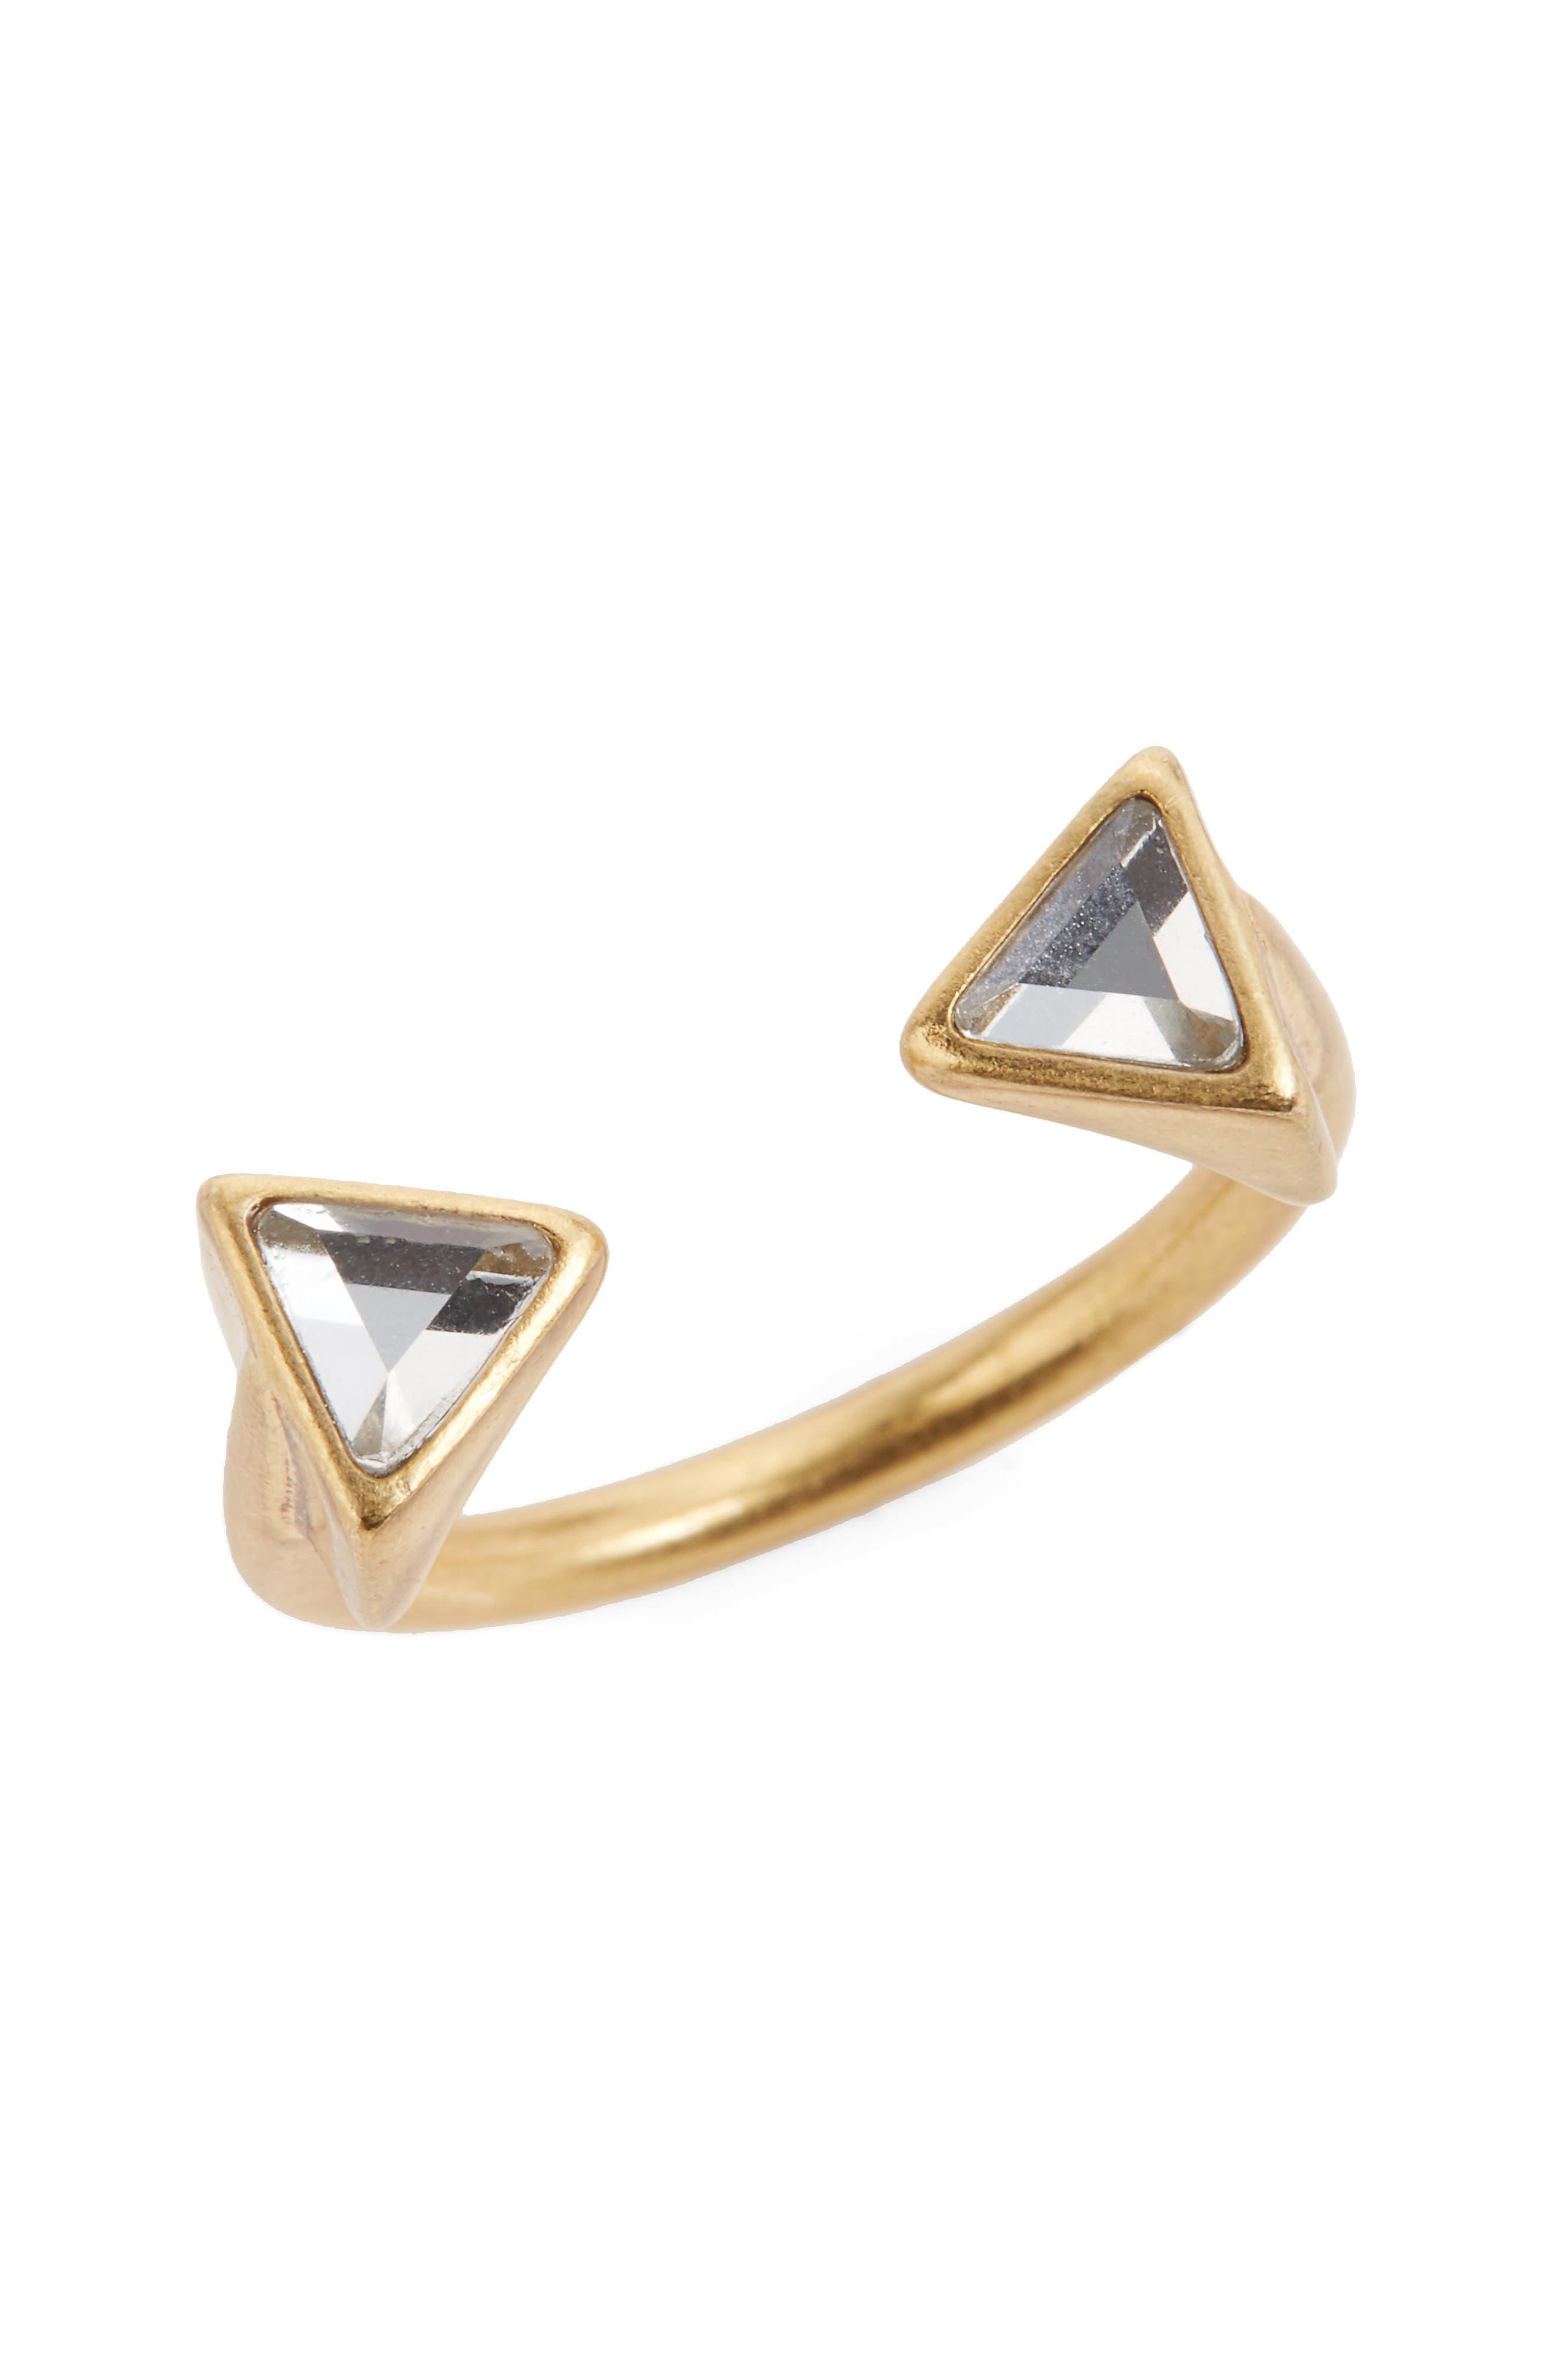 Alternate Image 1 Selected - Madewell Crystal Ball Ring